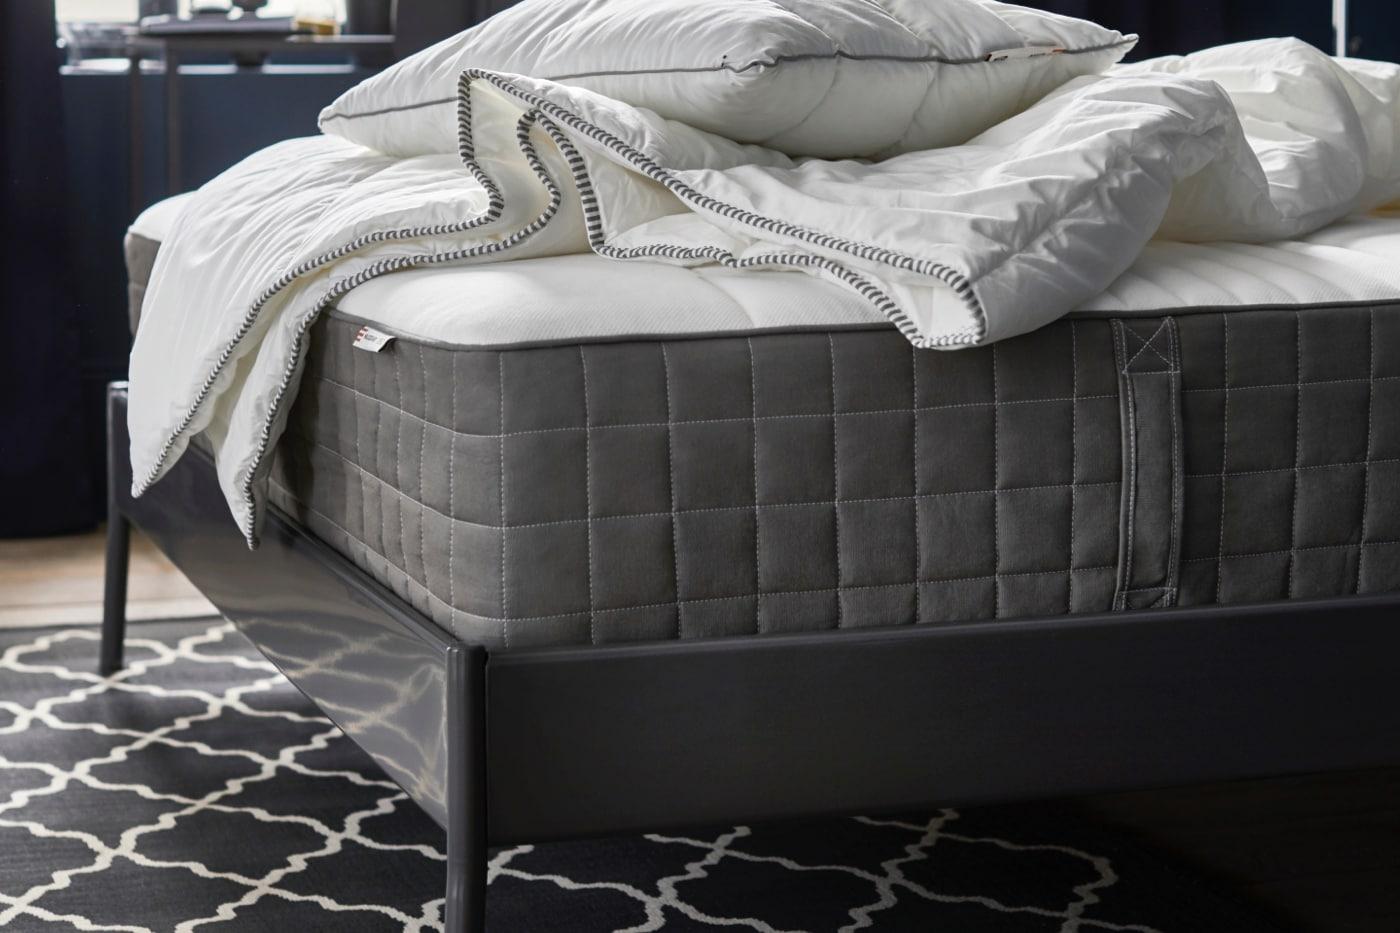 matratzen ratgeber welche matratze passt zu mir ikea. Black Bedroom Furniture Sets. Home Design Ideas